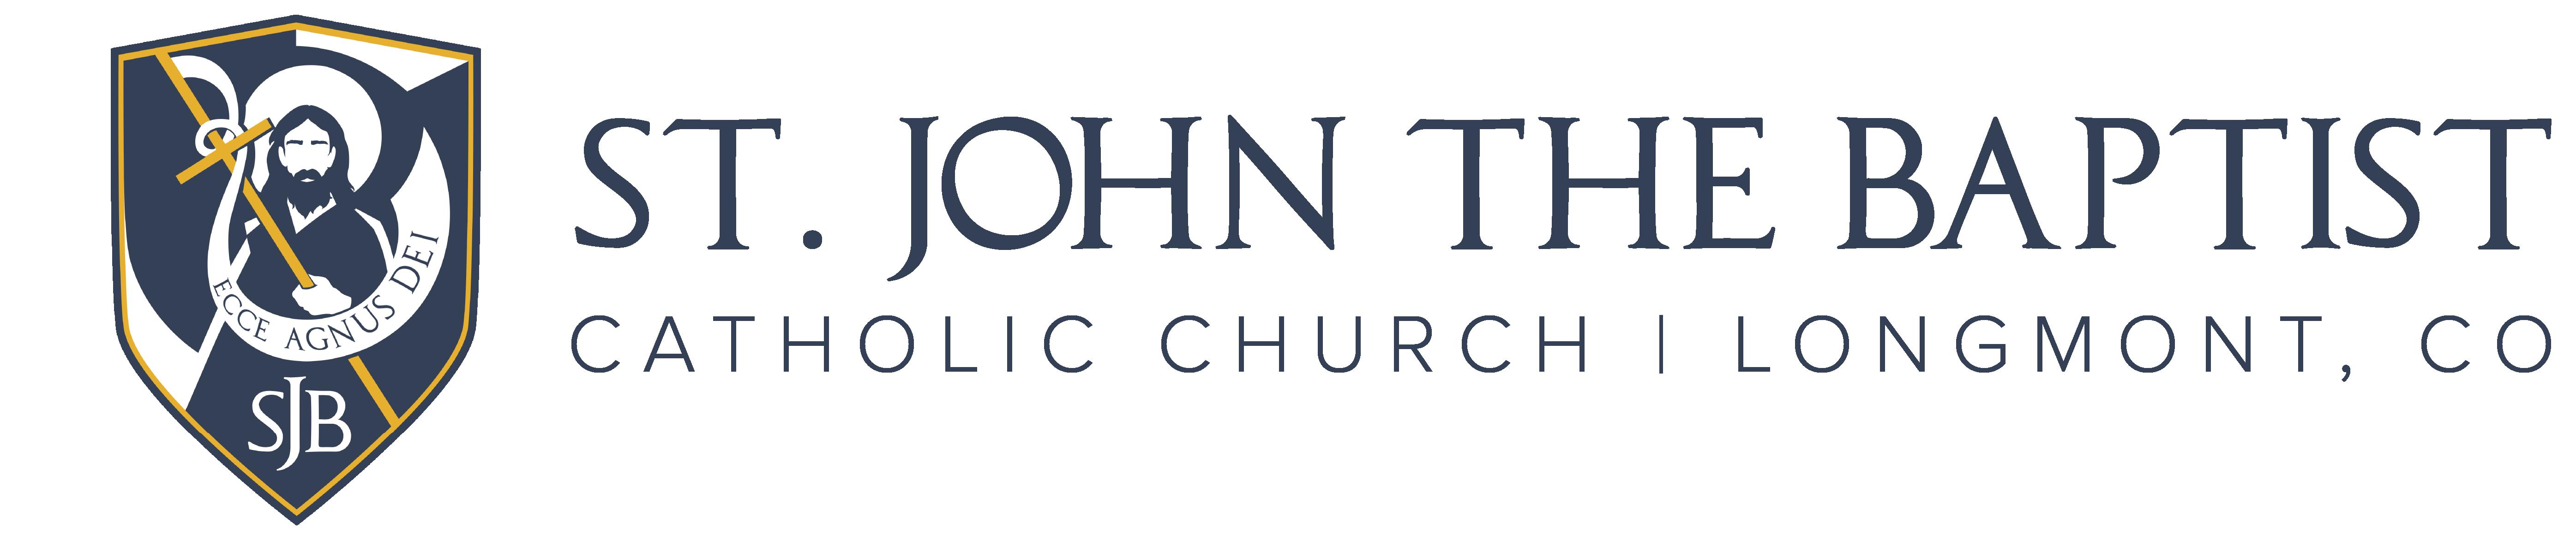 Home | St  John the Baptist Catholic Church, Longmont, CO